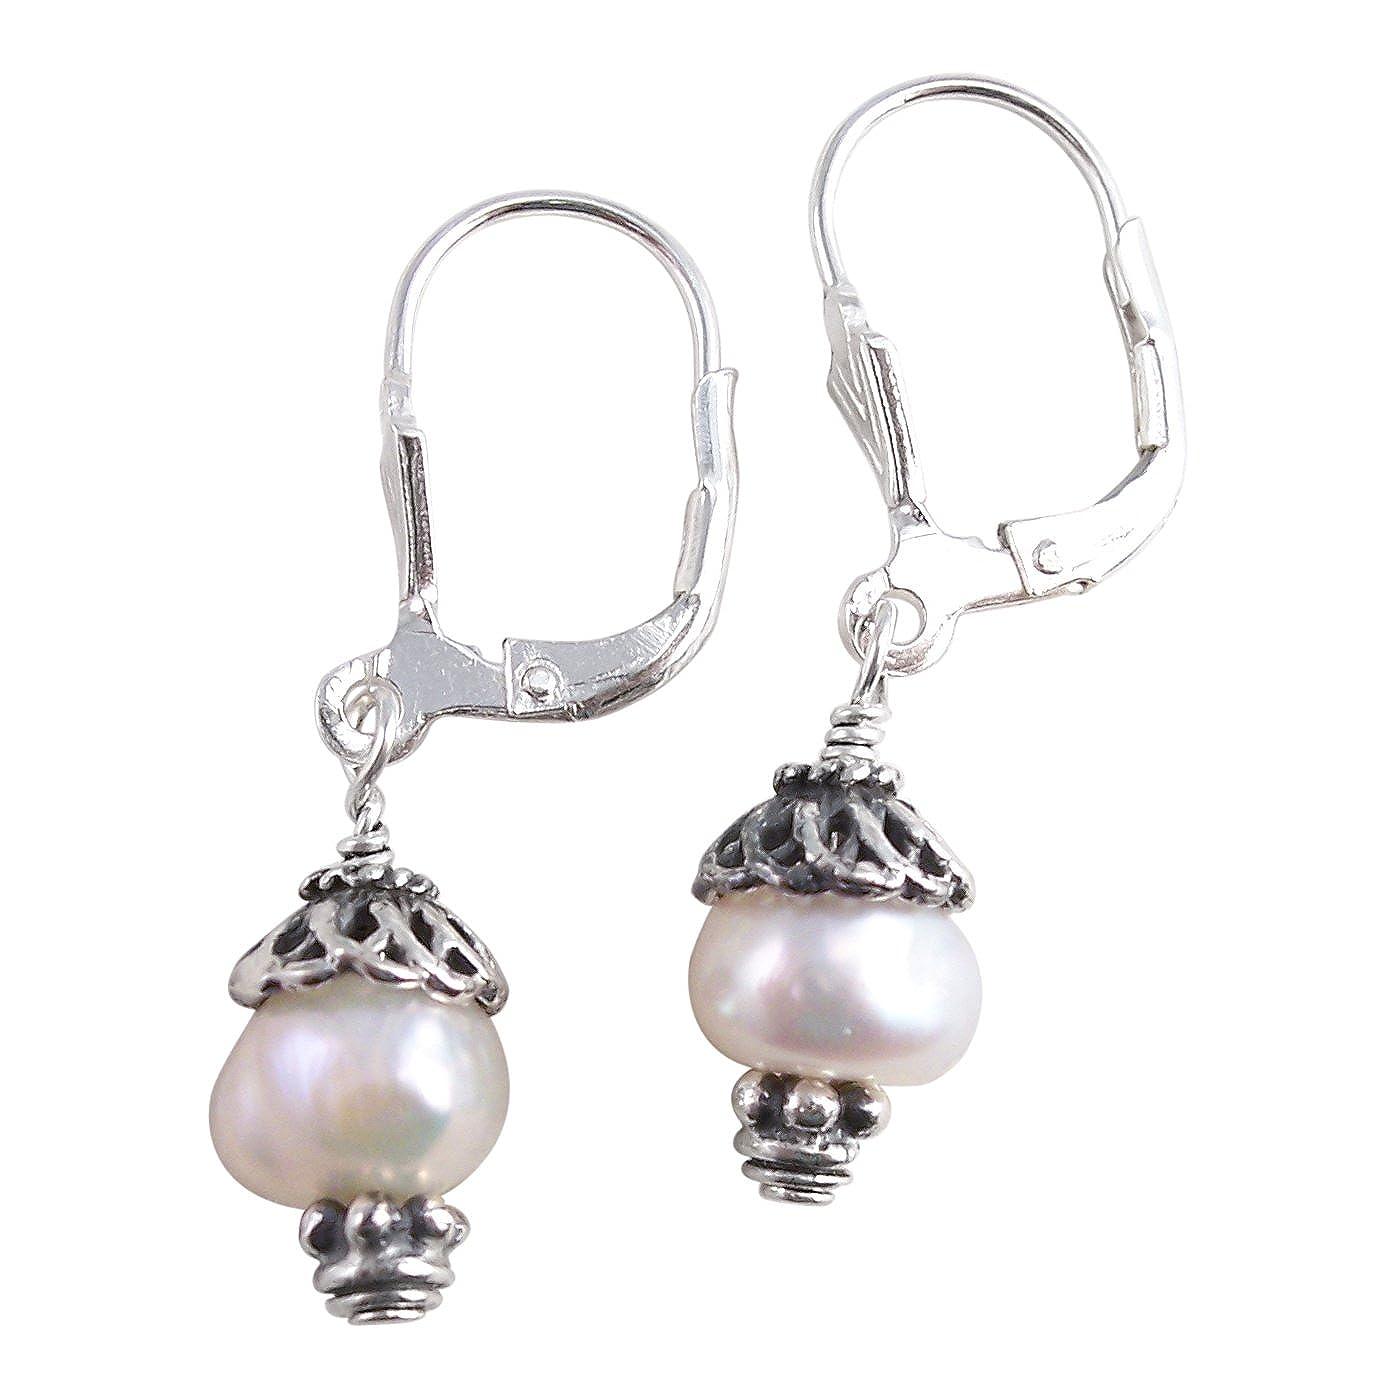 Sterling Silver Laura Pearl Leverback Drop Earrings Sosi B. E73LB